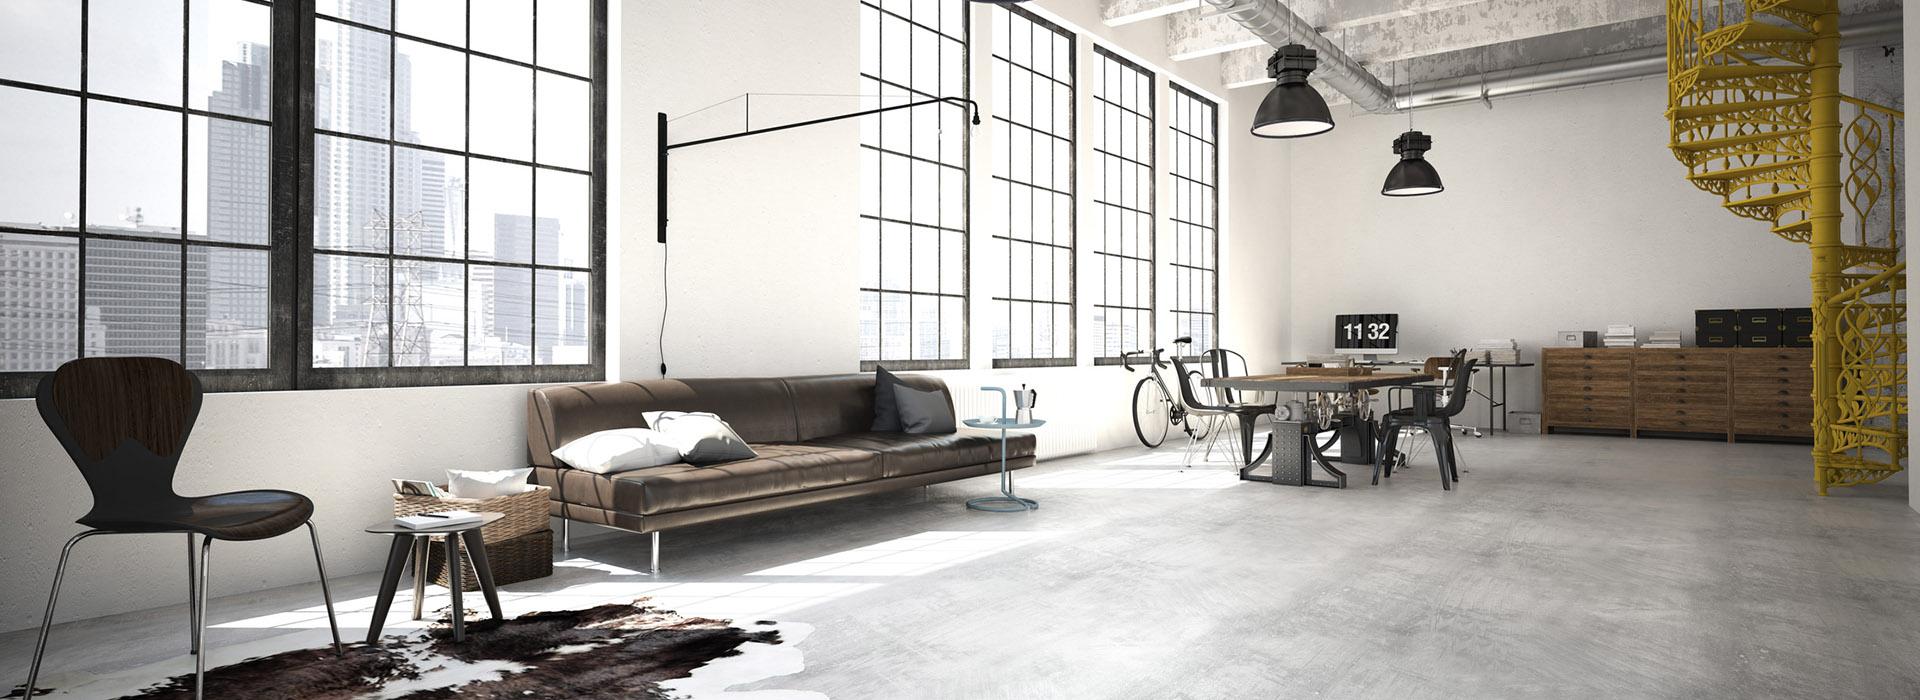 Podłogi mikrocementowe od SatineStone